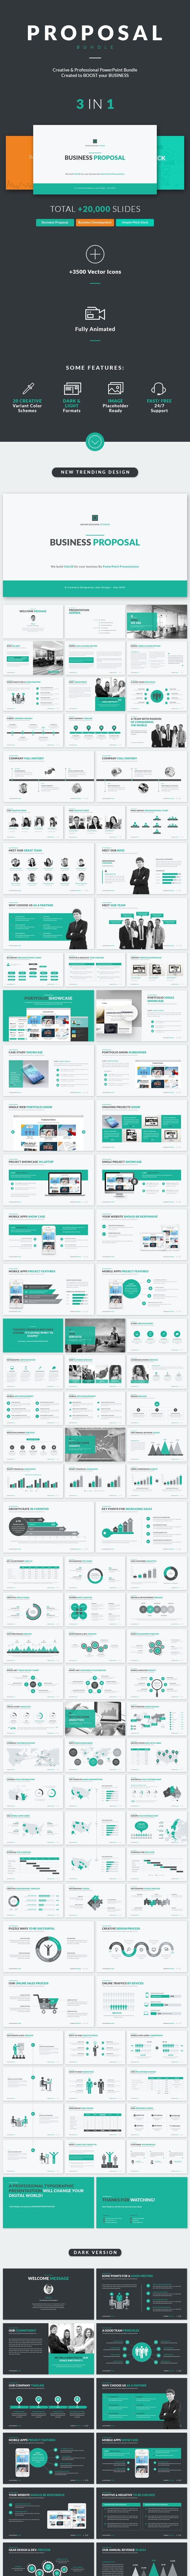 Proposal PowerPoint Bundle - Business PowerPoint Templates